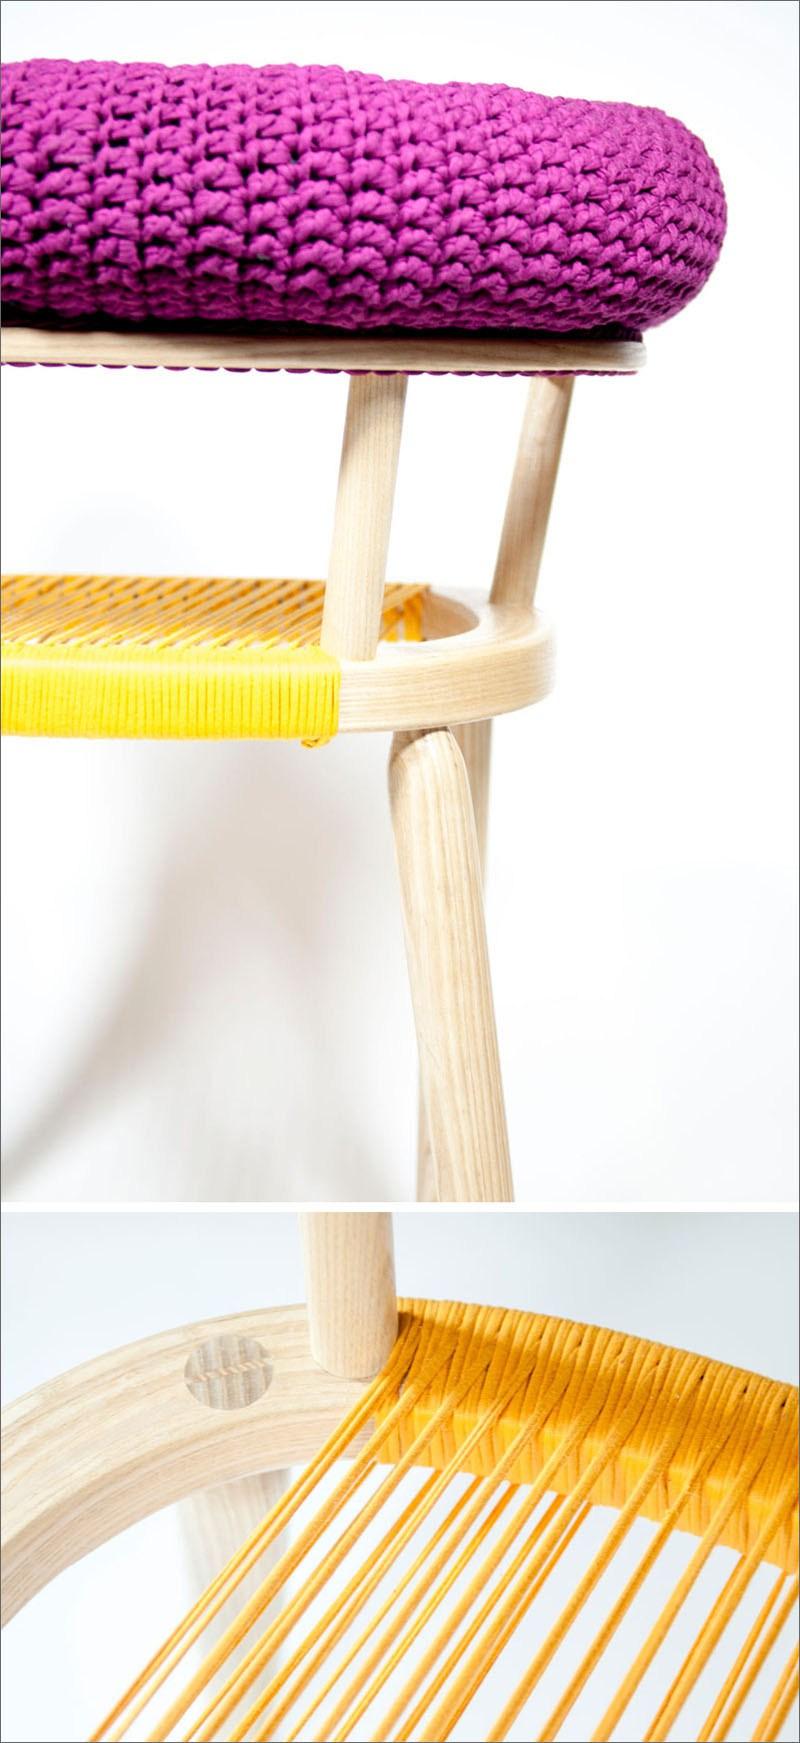 meubles-tisses-et-tricotes8_veegadesign_cd-mentiel-magazine